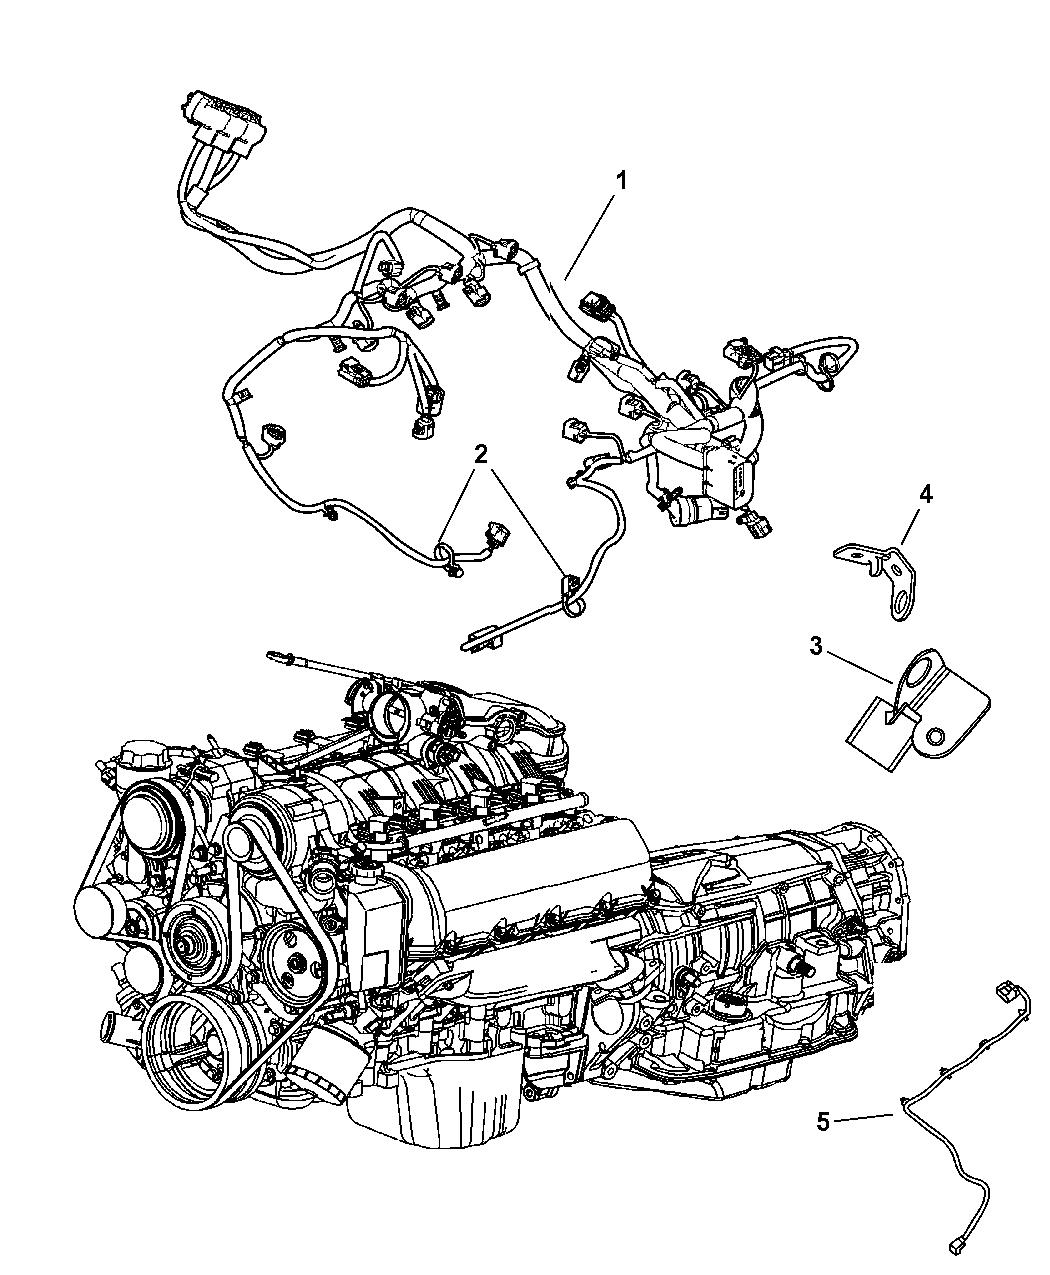 mopar 5148160aa 2010 jeep grand cherokee fuse box diagram 2010 jeep grand cherokee engine diagram #8